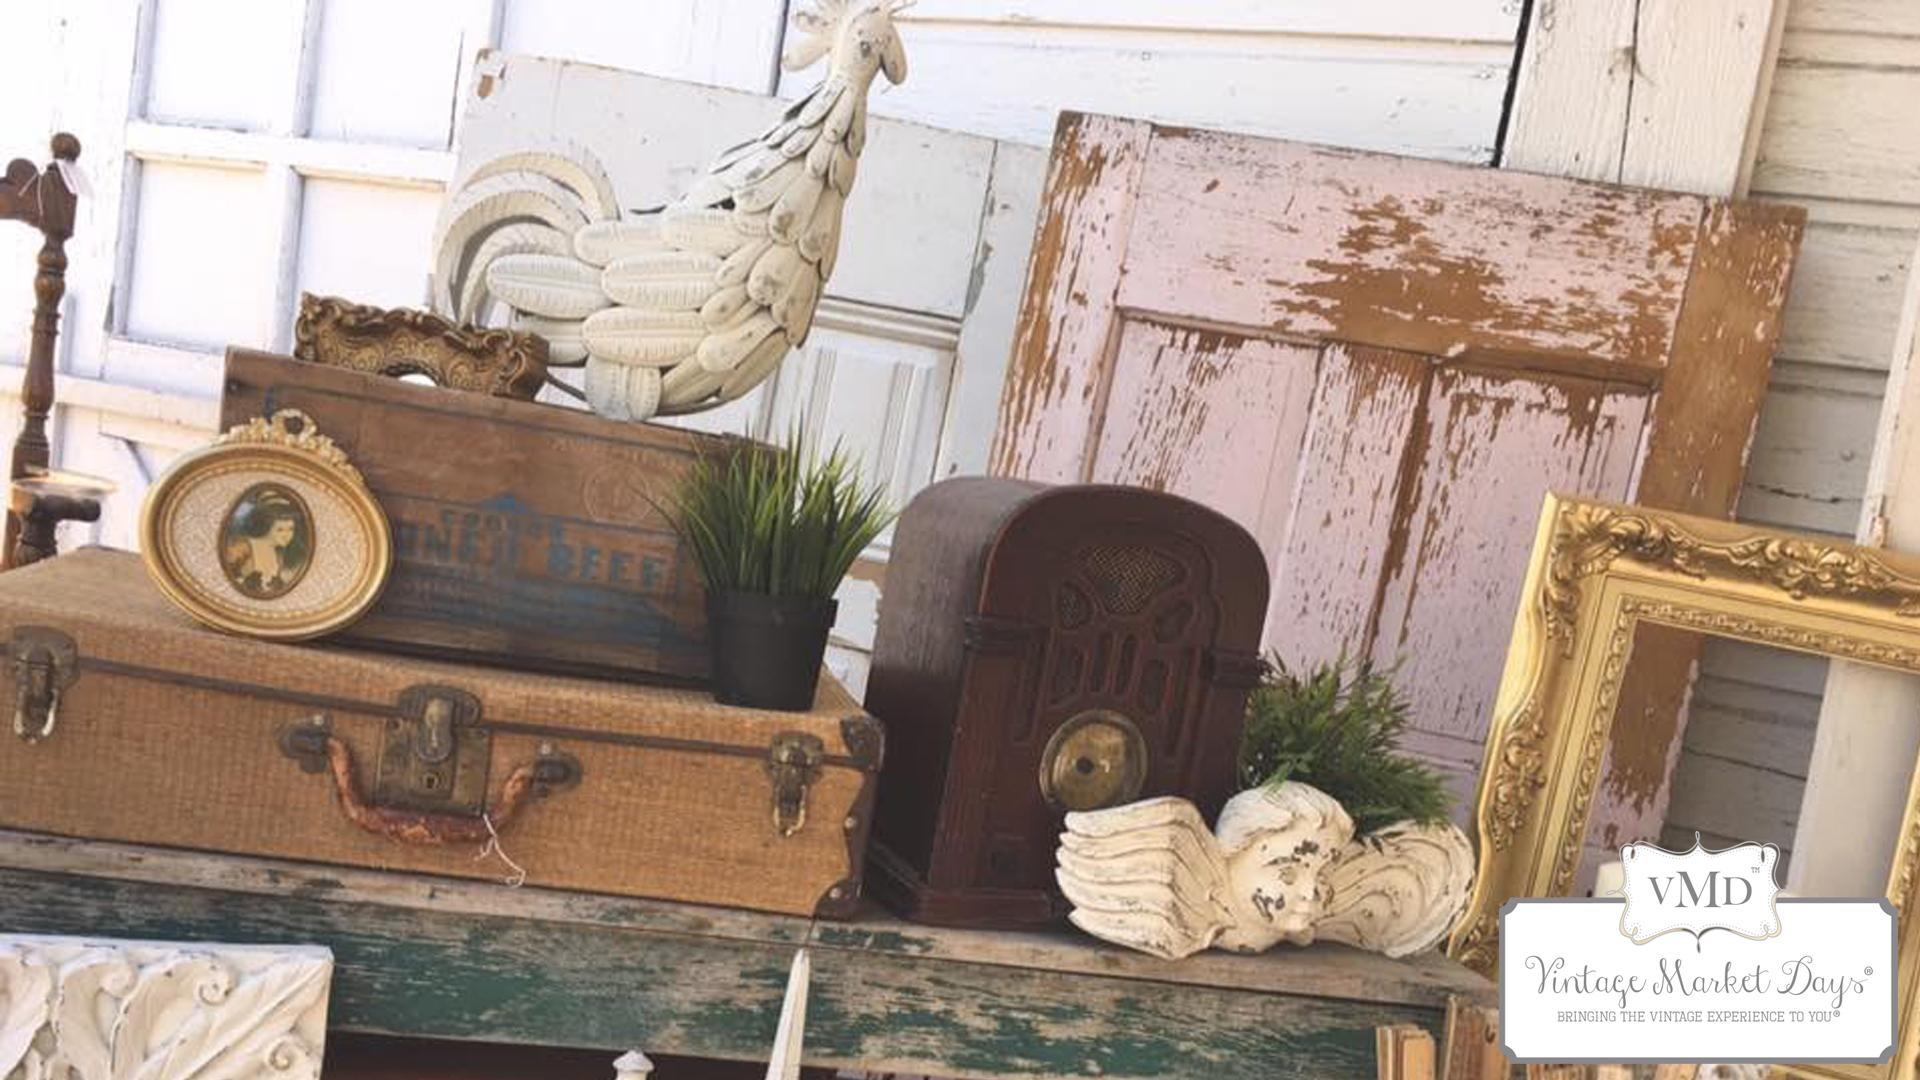 Vintage Market Days® of Central Georgia presented by Vintage